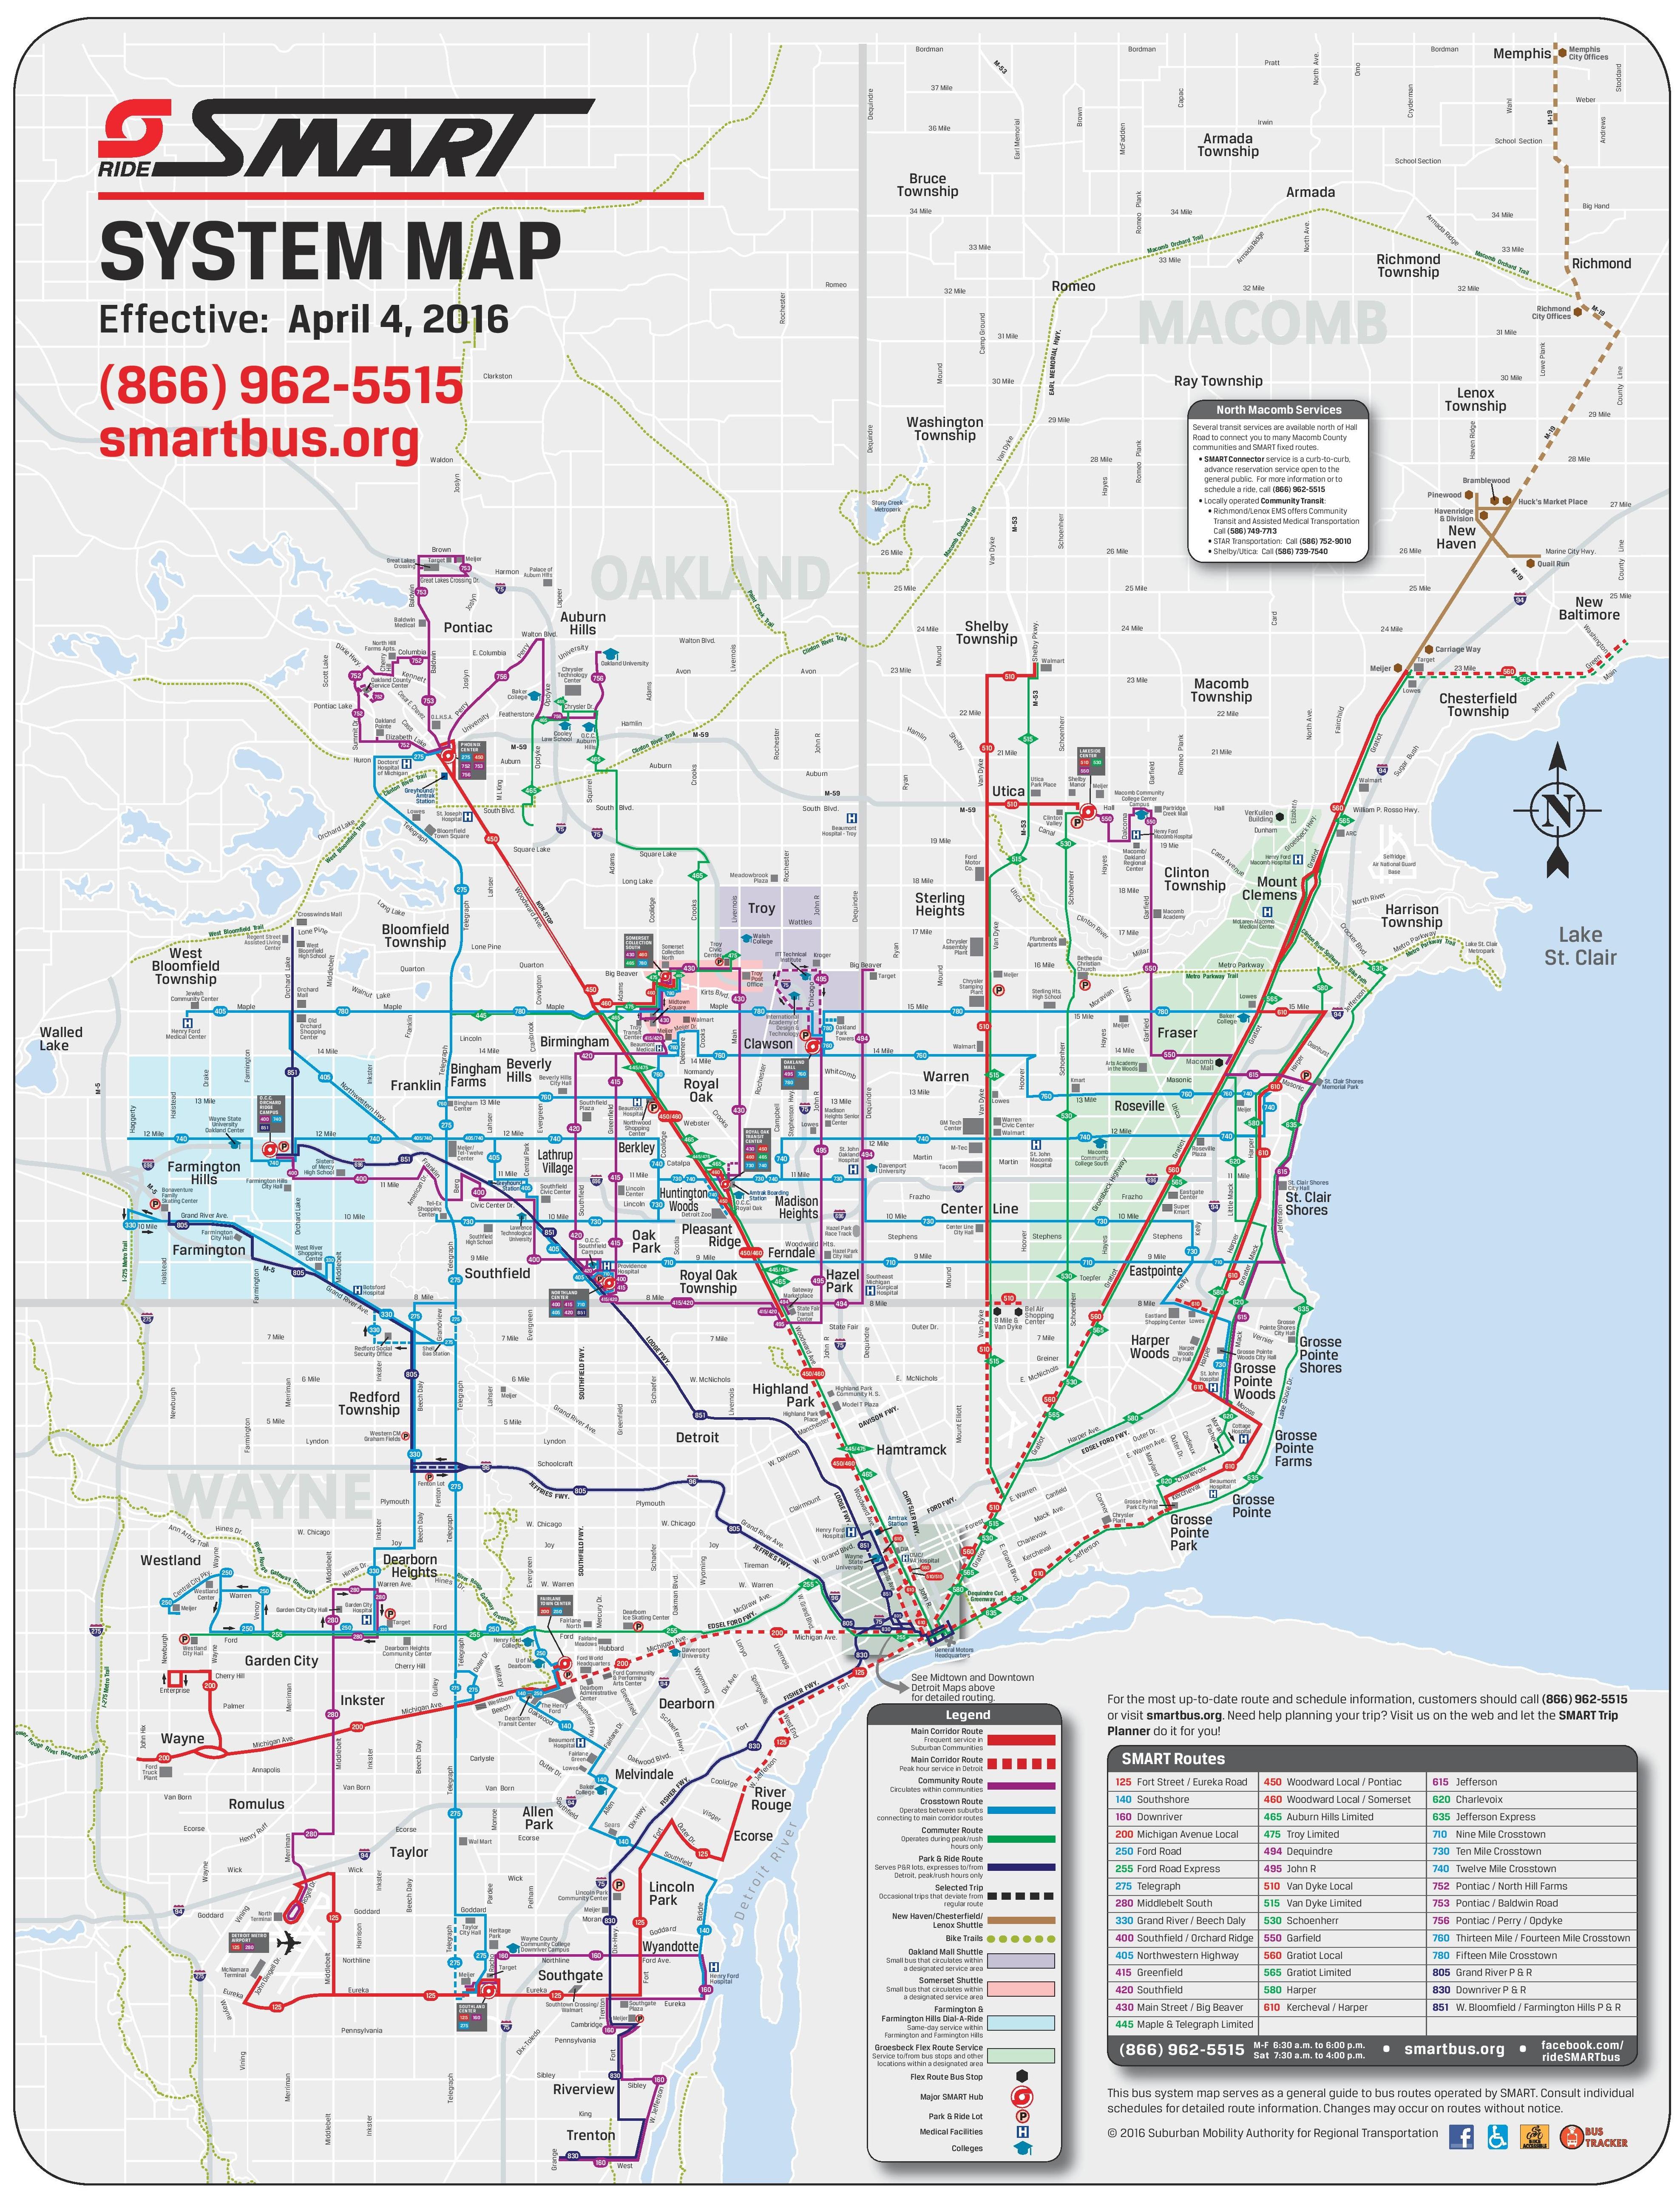 Detroit In Map Of Usa – [mapusa.ticketsbox.us] on detroit area, baltimore map usa, detroit on us map, detroit state map, detroit suburbs map, pittsburgh map usa, city street maps usa, michigan usa, detroit on world map, minneapolis map usa, milwaukee map usa, detroit city map,